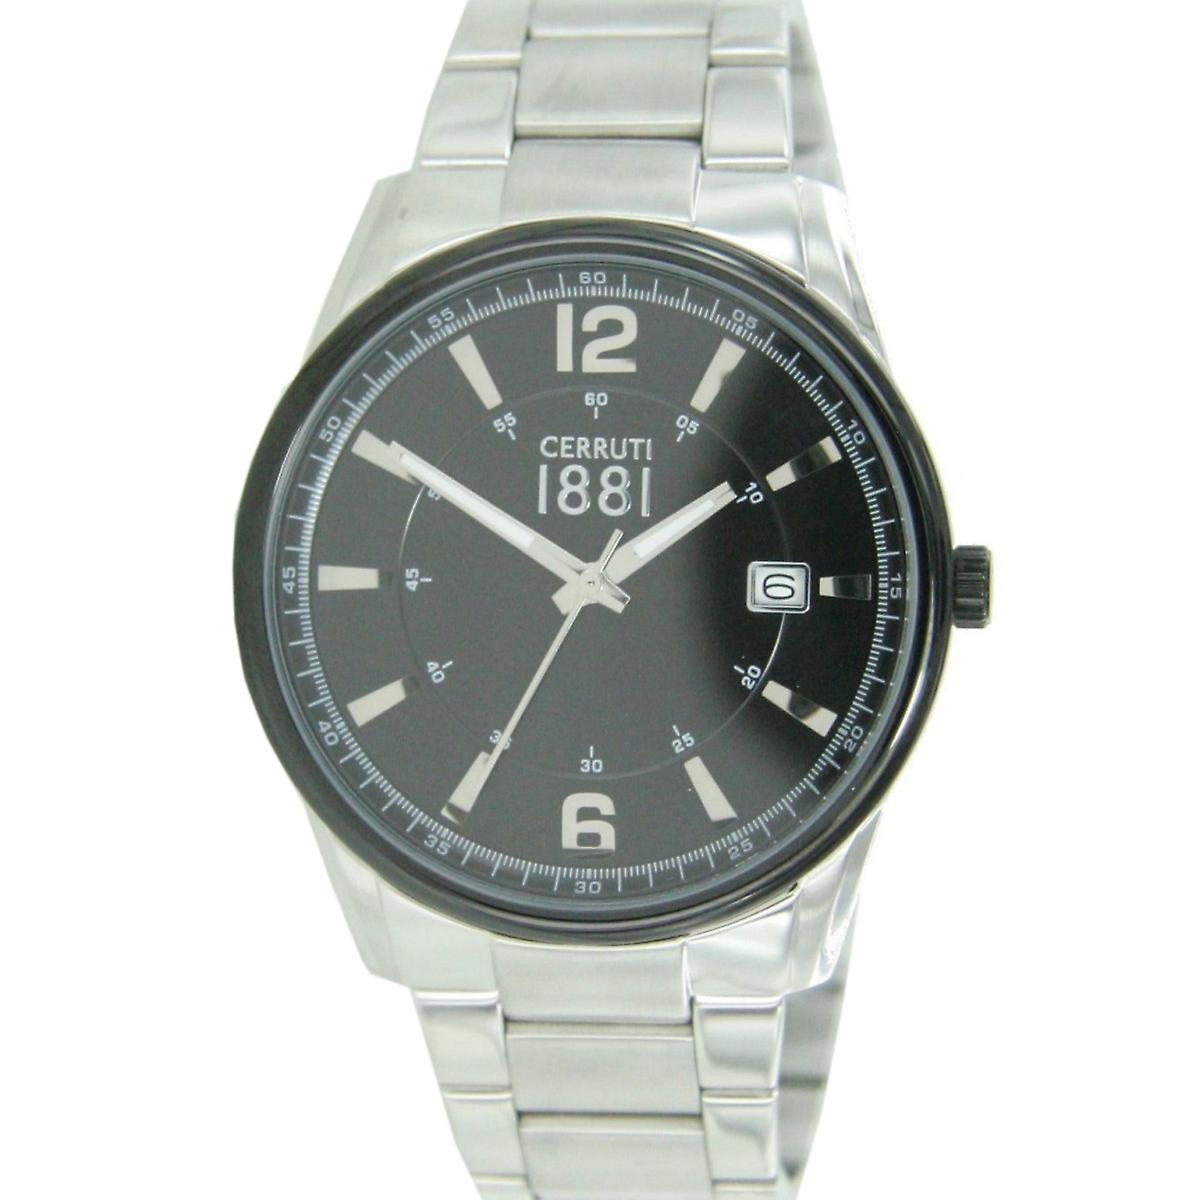 09e67fb7a0e1a مشاهدة 1881 شيروتي رجالي ساعة اليد الفولاذ المقاوم للصدأ CRA103STB02MS